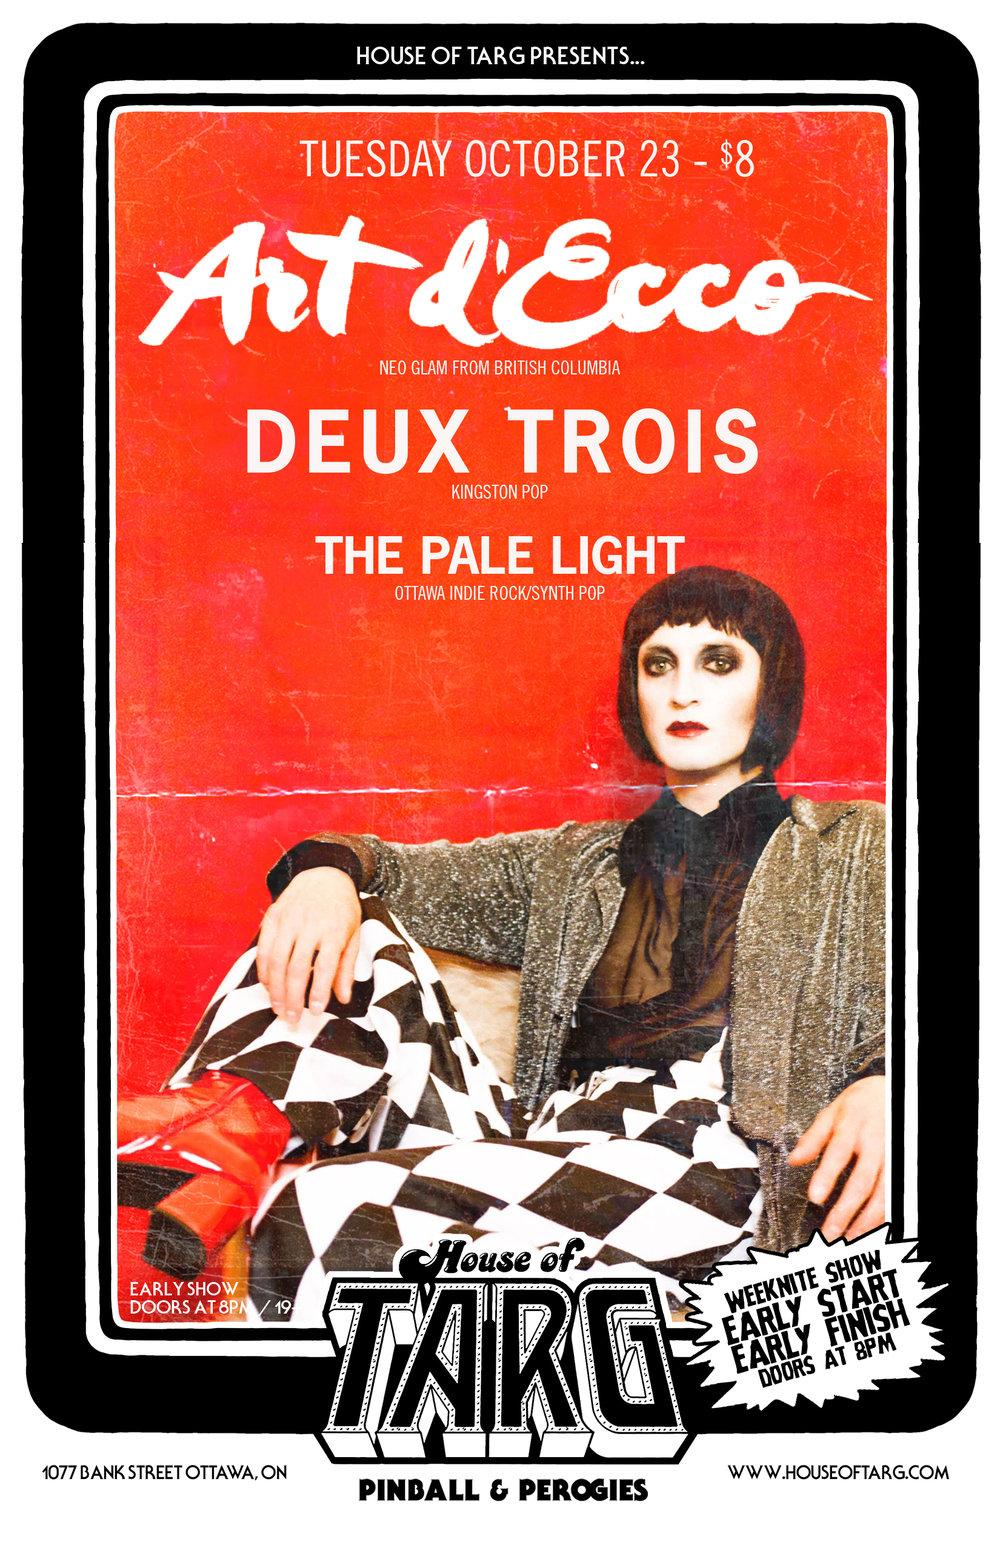 ART Decco Tues Oct 23.jpg